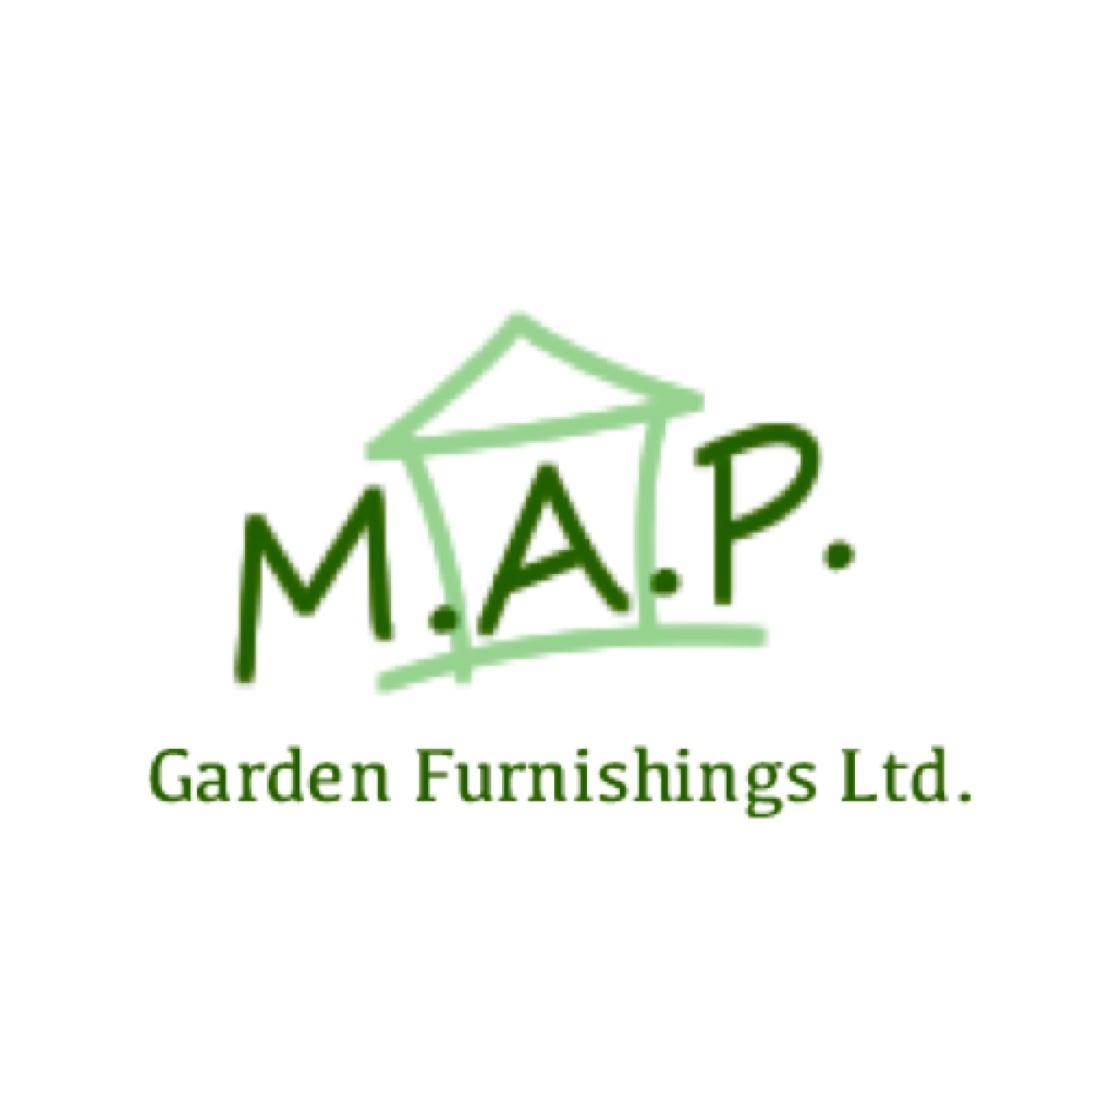 Protek Royal Exterior Natural Stain - Antique Teak (1 litre)